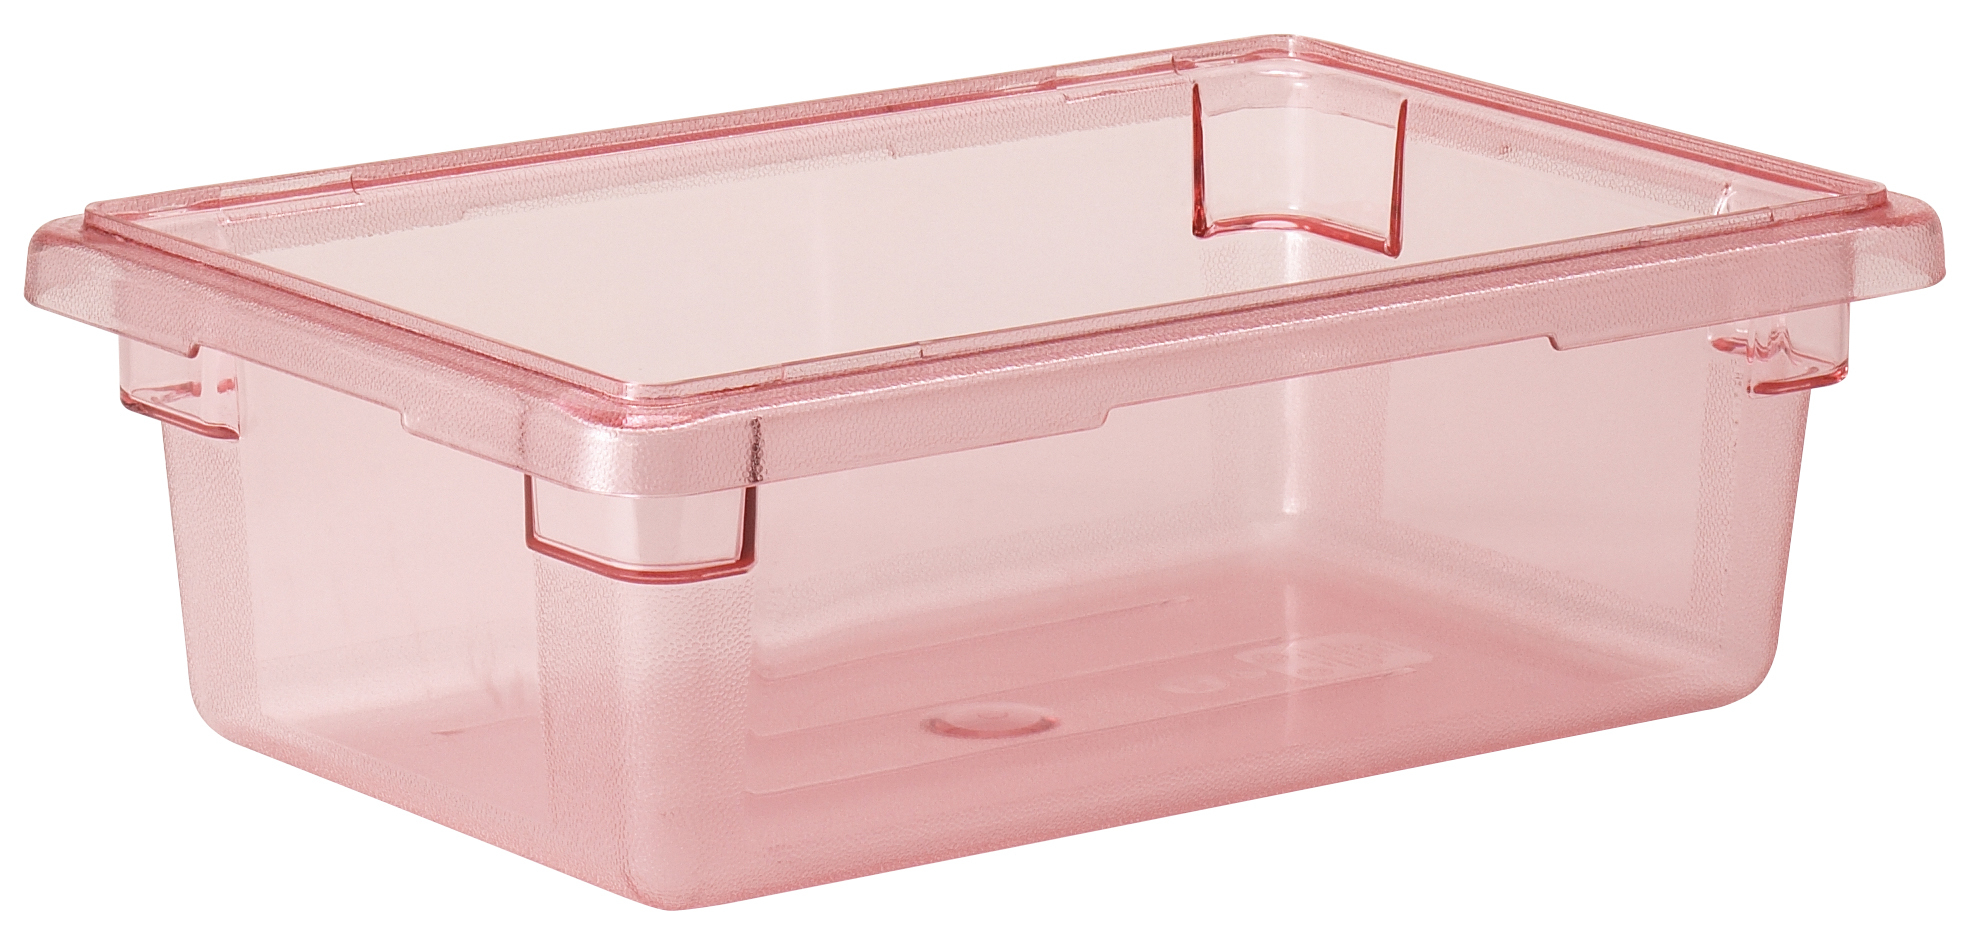 Cambro 12186CW467 food/beverage storage container